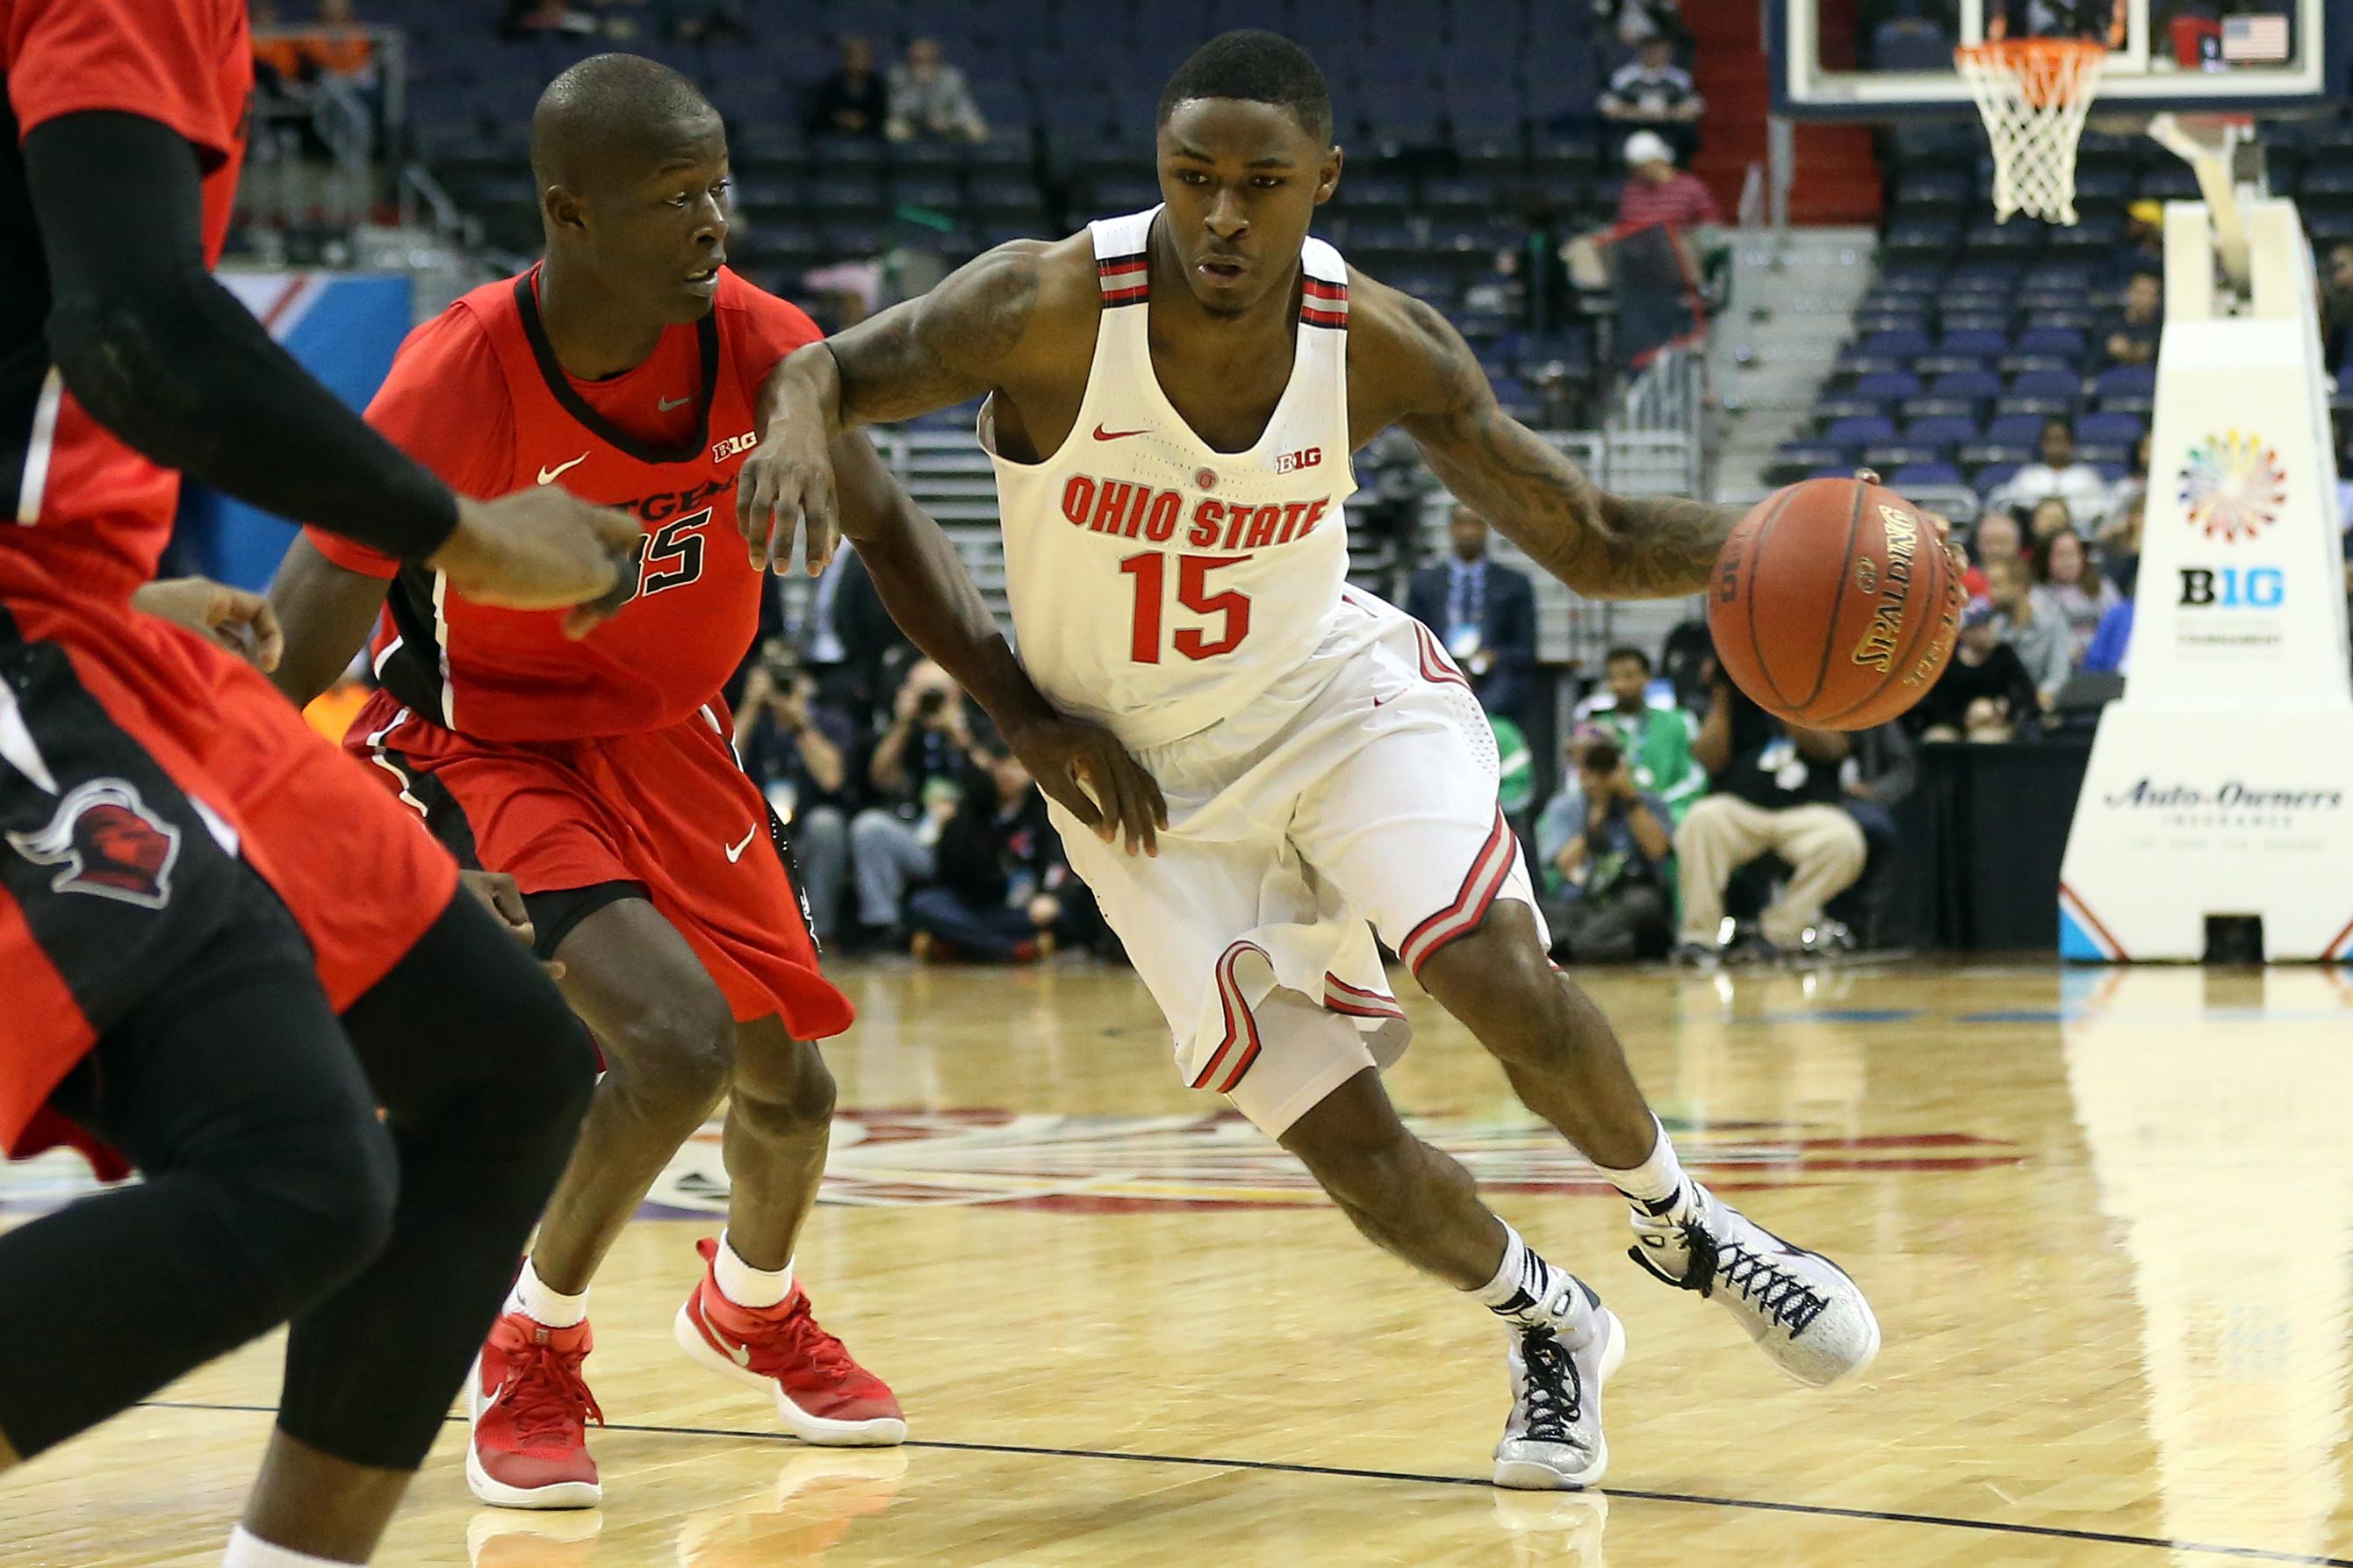 9926403-ncaa-basketball-big-ten-conference-tournament-ohio-state-vs-rutgers